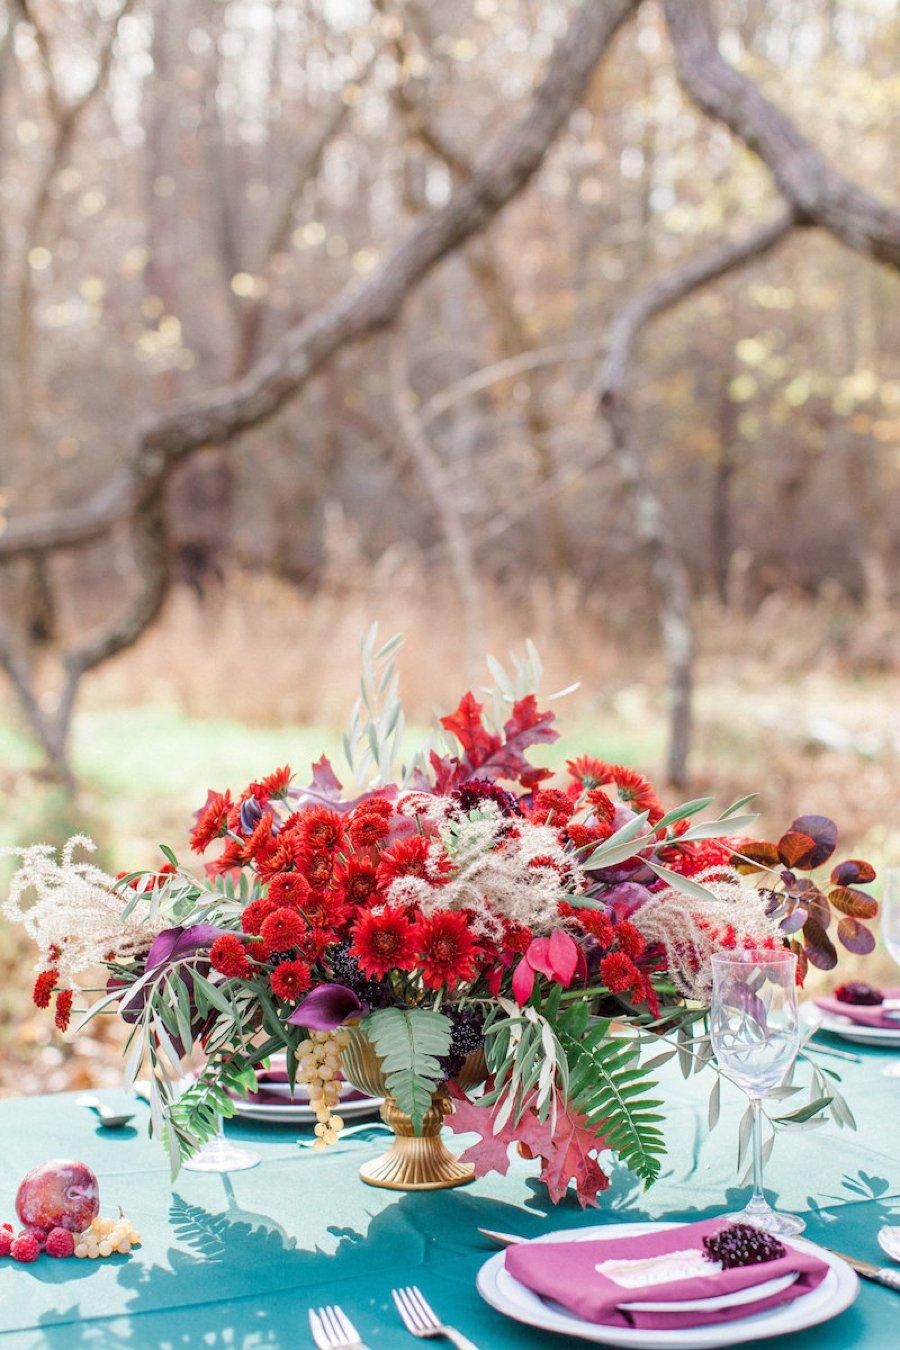 Red & Teal Whimsical Fall Wedding Ideas via TheELD.com